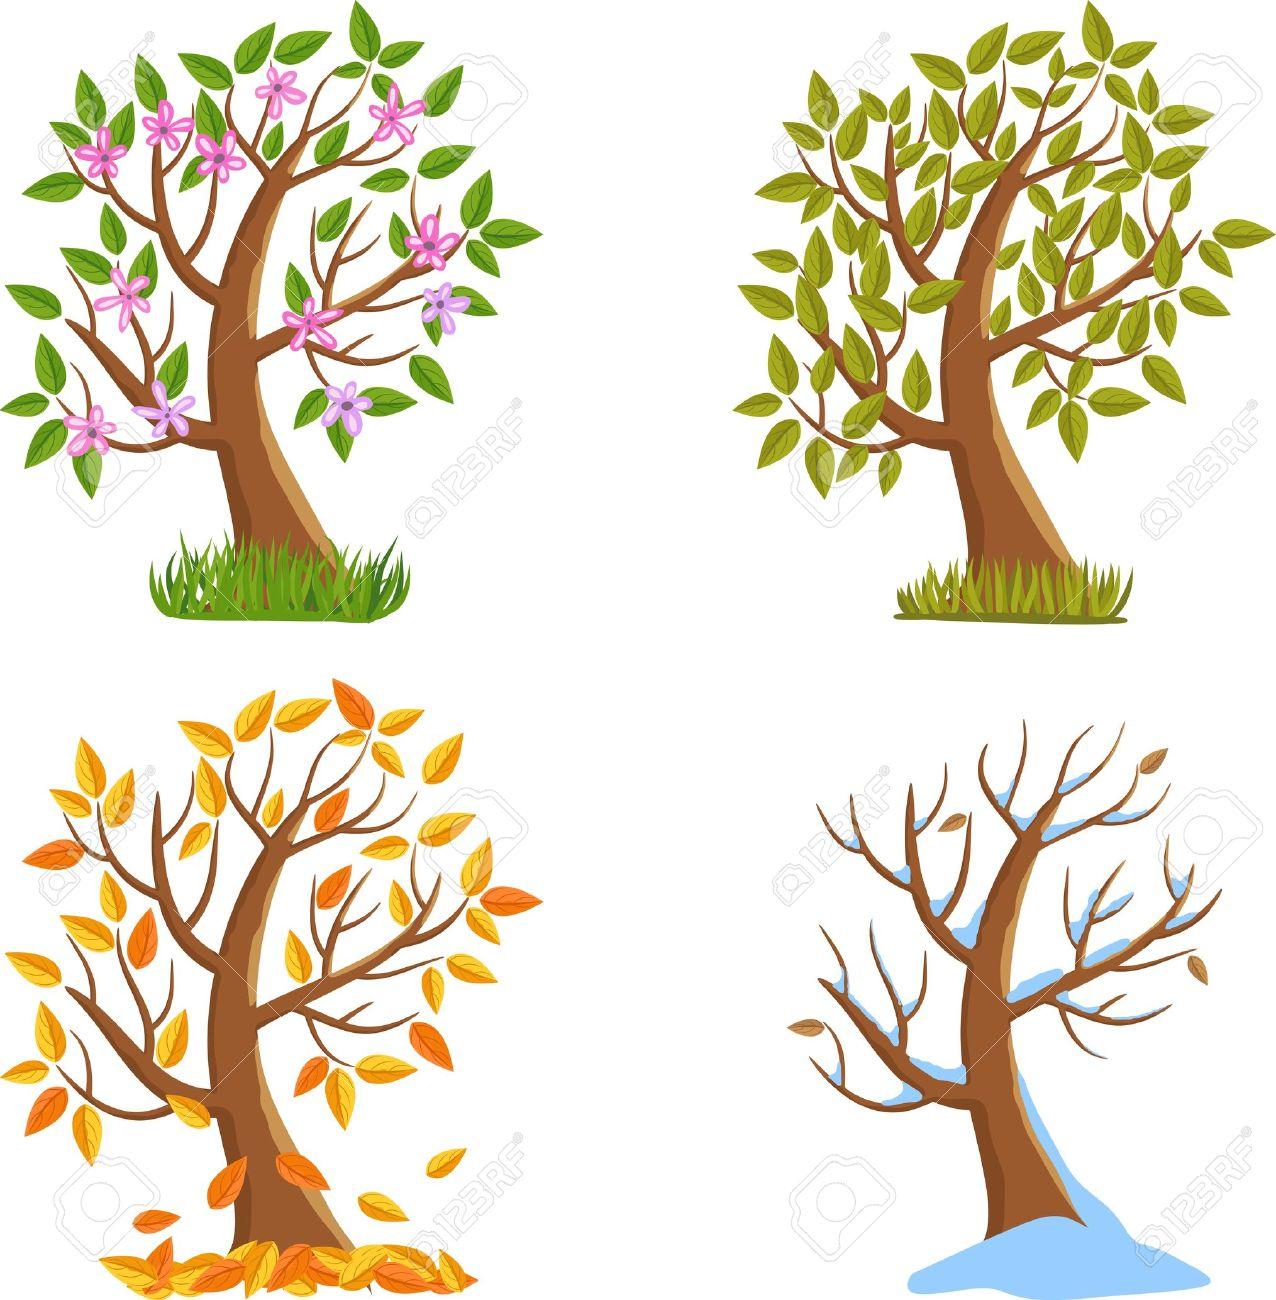 Spring, Summer, Autumn and Winter Tree Illustration. Stock Vector - 16038061